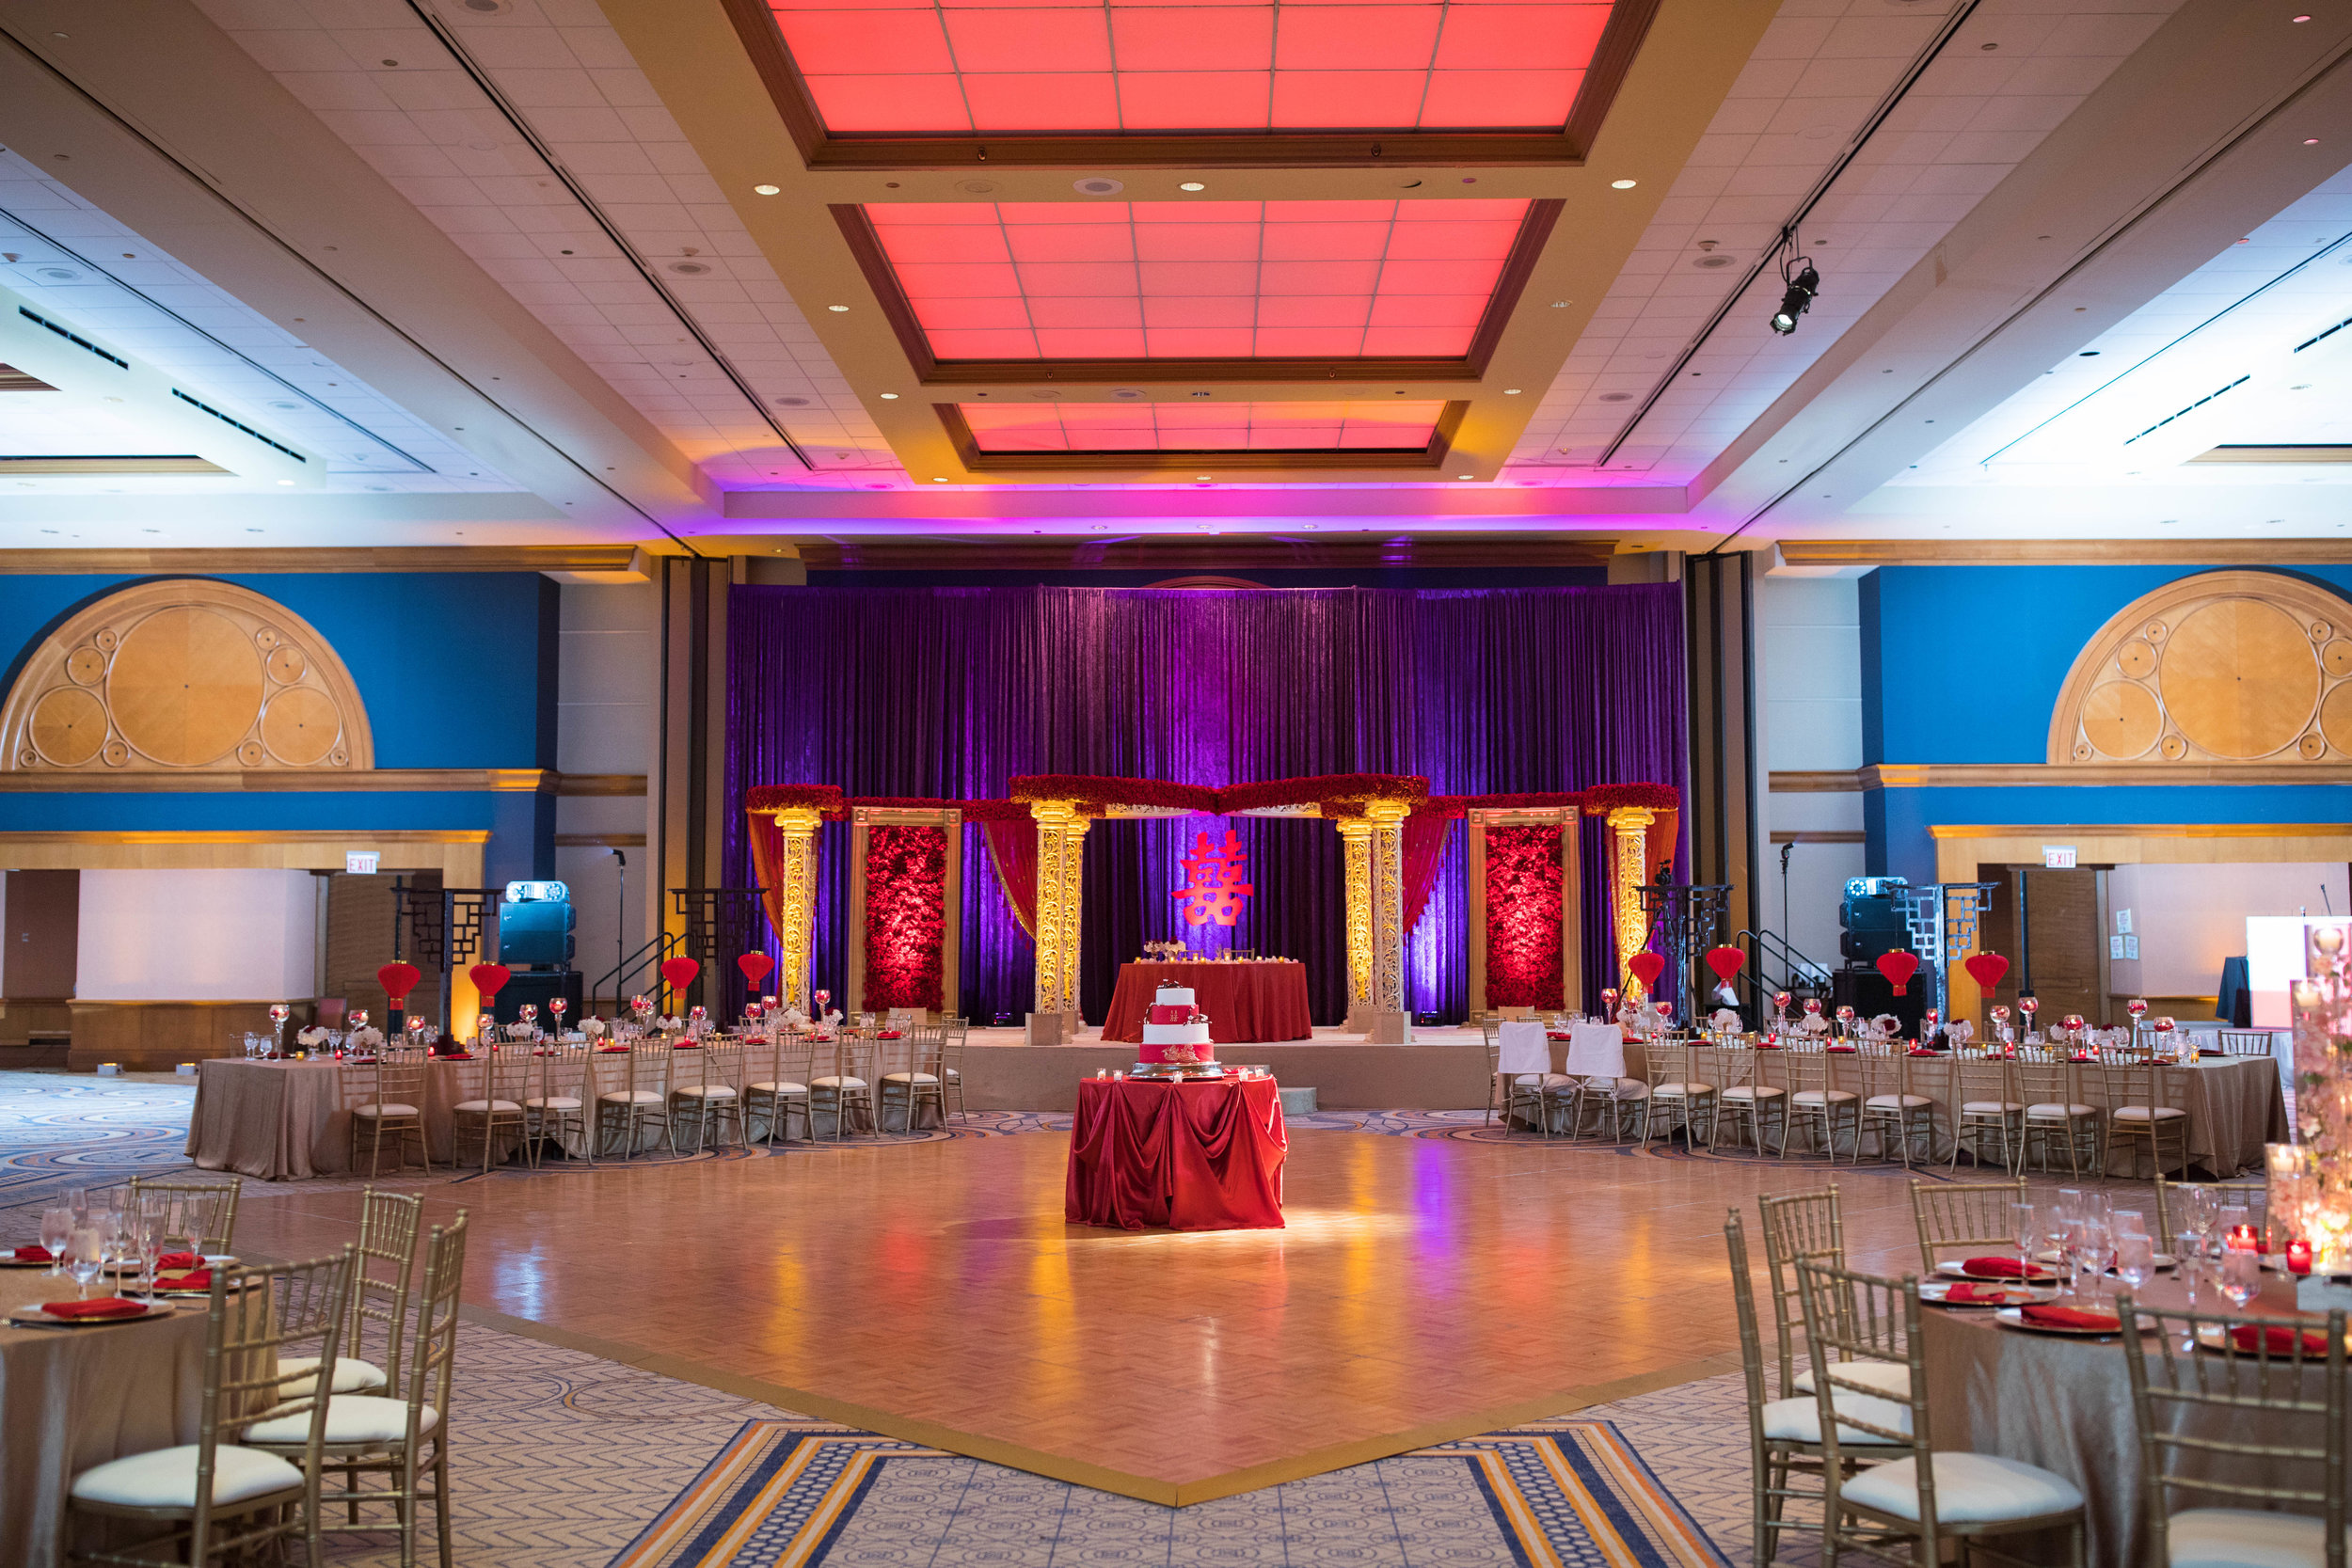 Reception - A fabulous celebration at the beautiful Sheraton Grand Chicago hotel.